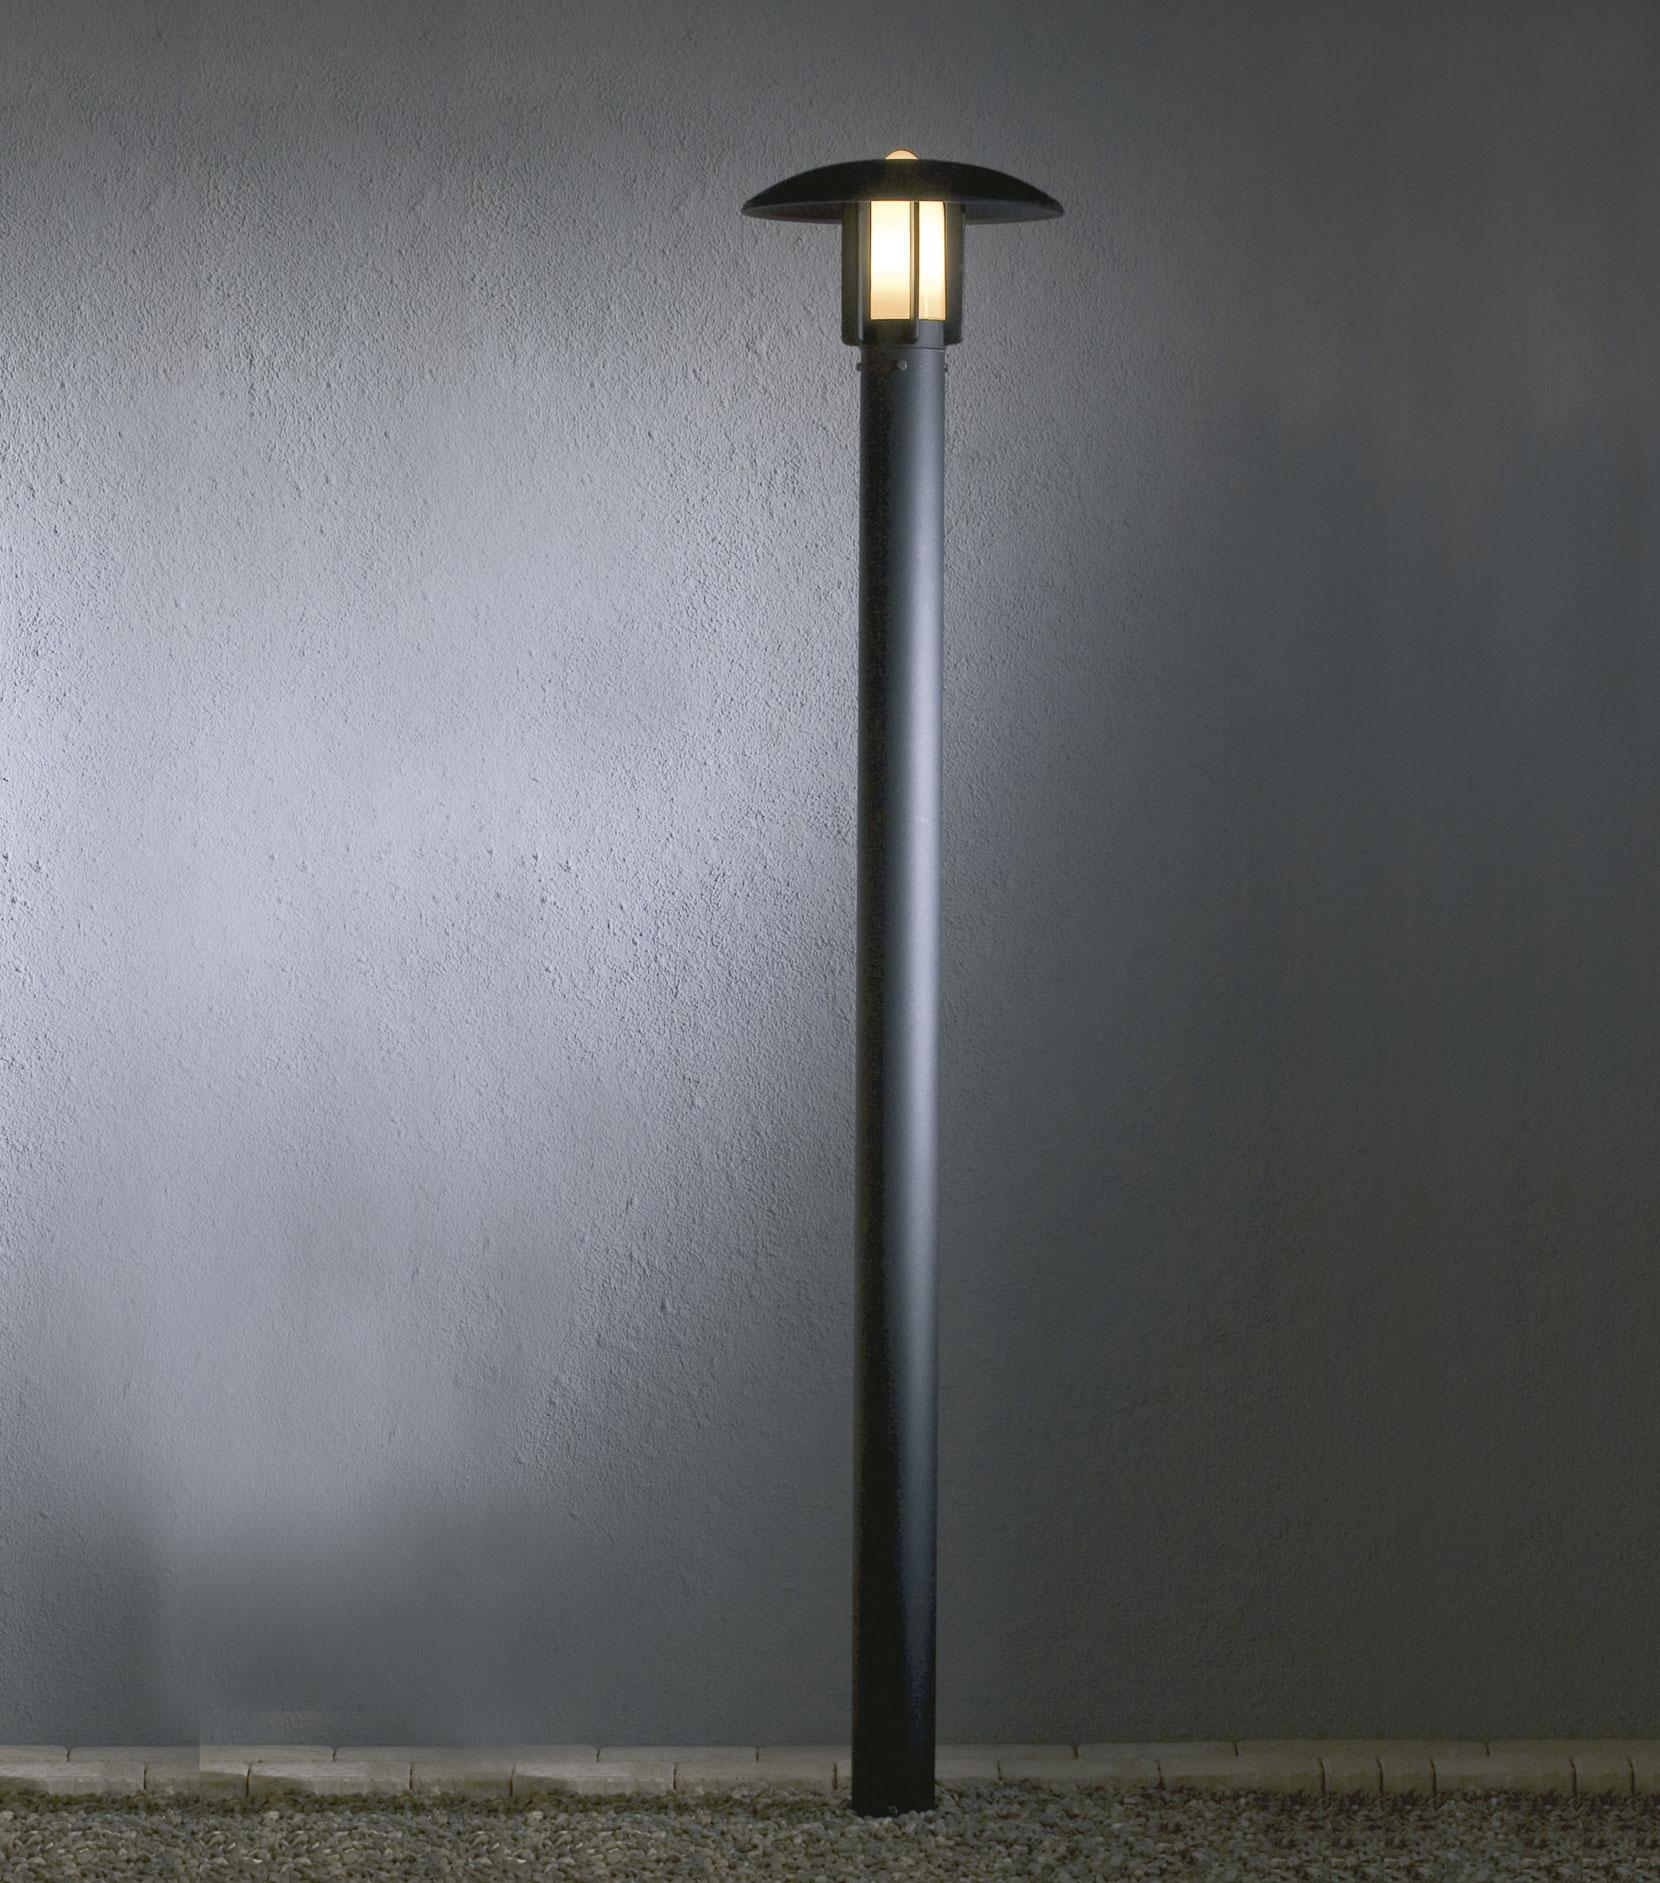 Shorter Lamp Post For Garden And Light Commercail Use